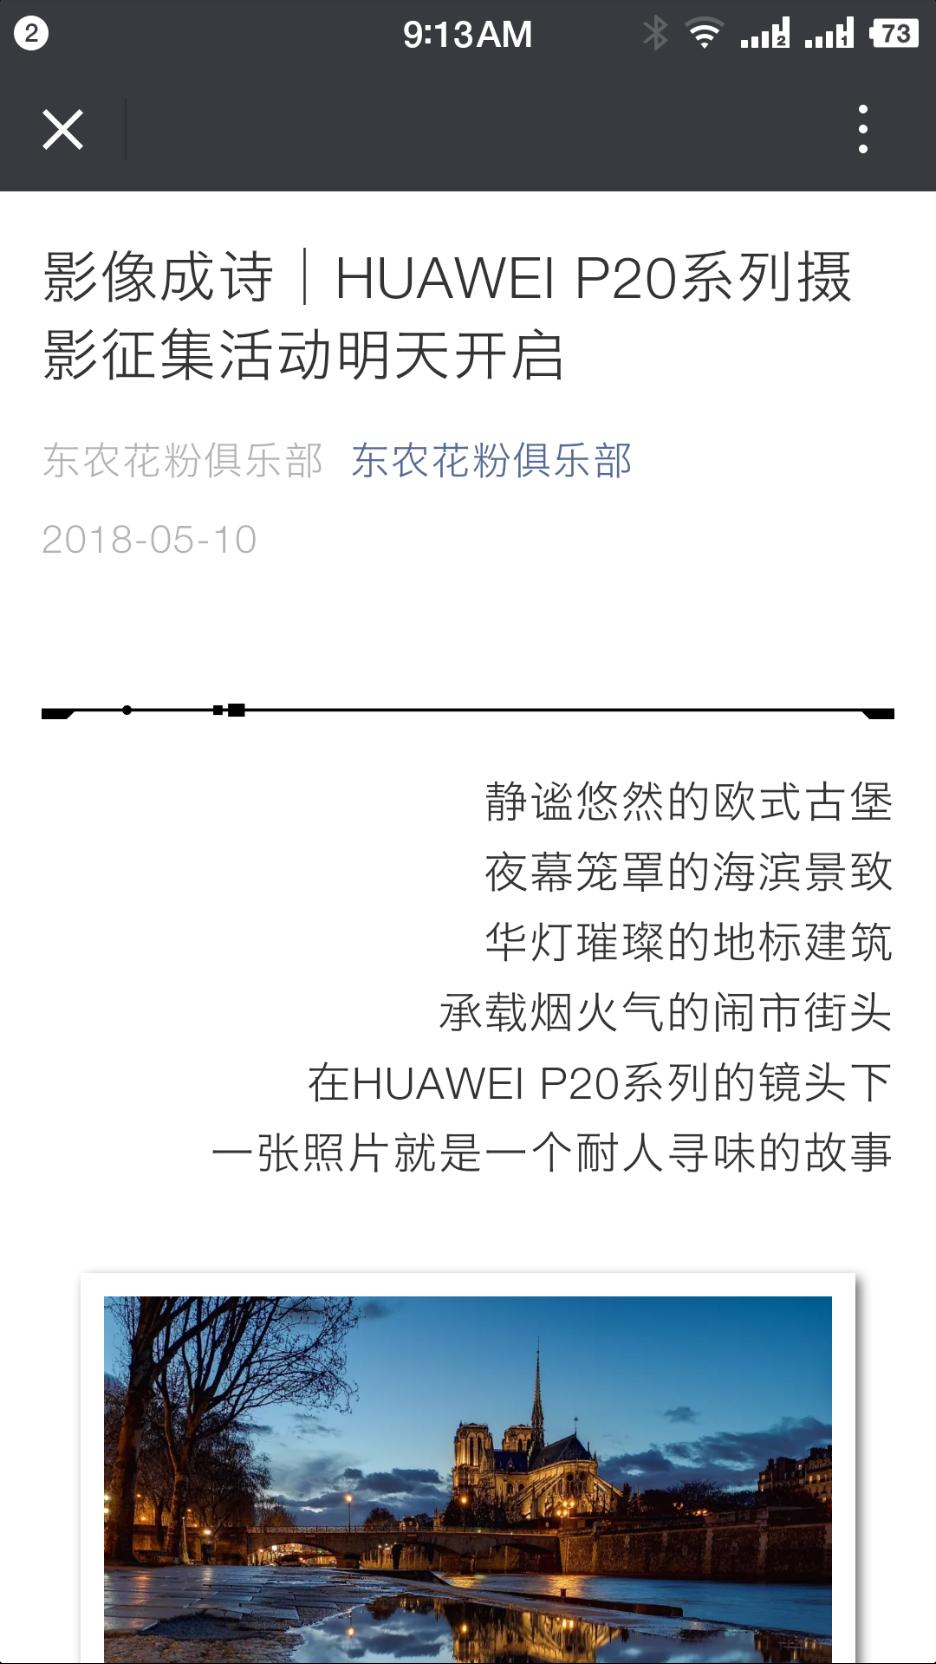 Screenshot_2019-02-07-09-13-16-714_WeChat.png